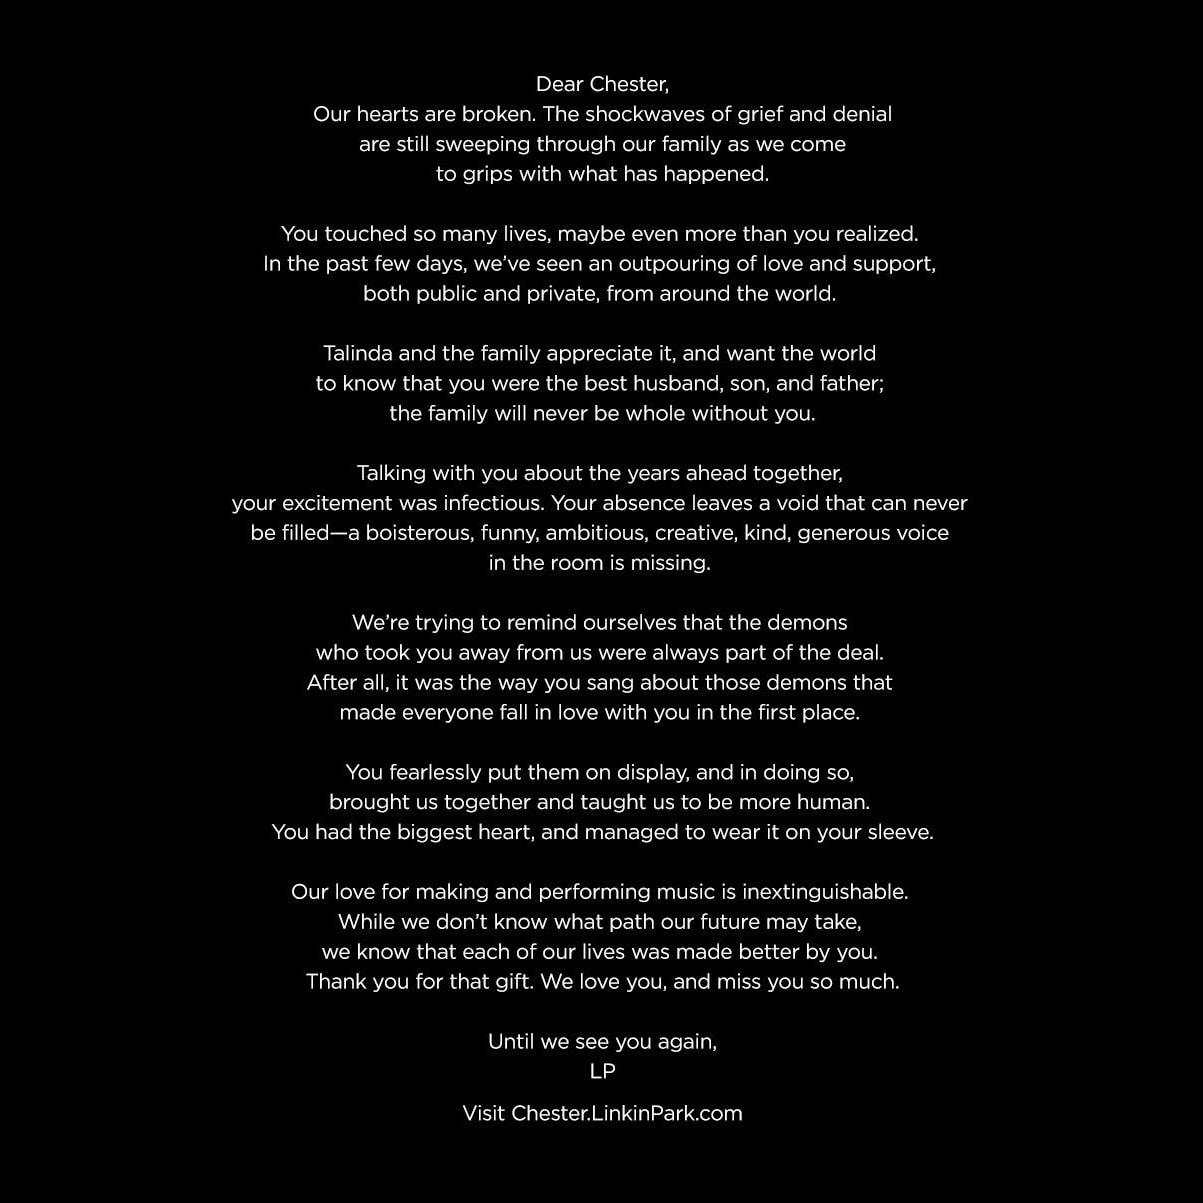 Linkin Park メンバーが天国の Chester へ向けた手紙を公開